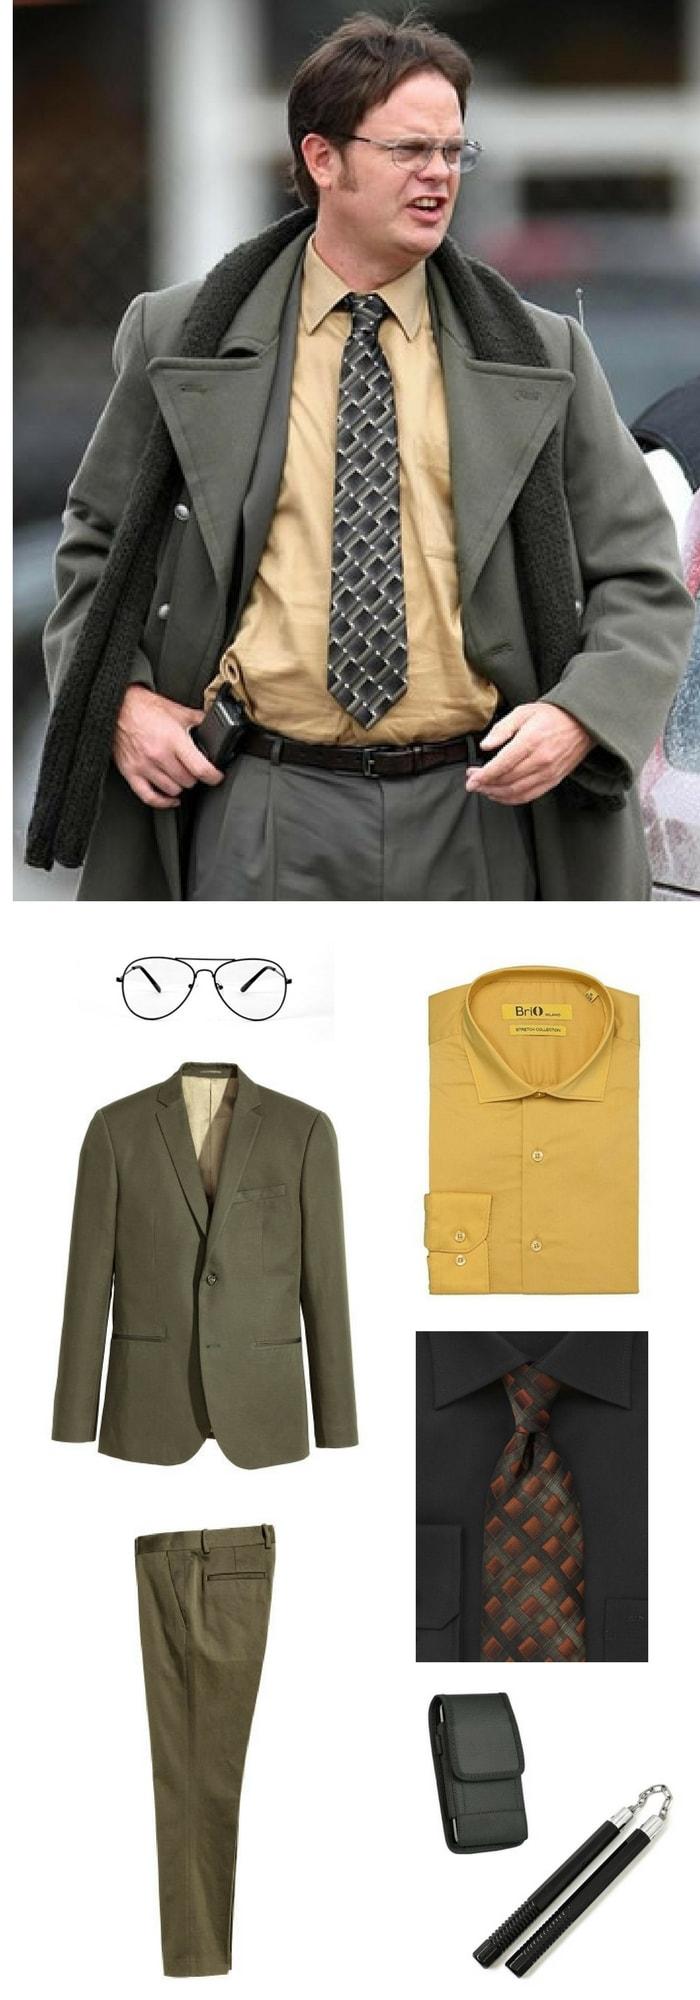 Dwight Schrute Halloween Costume